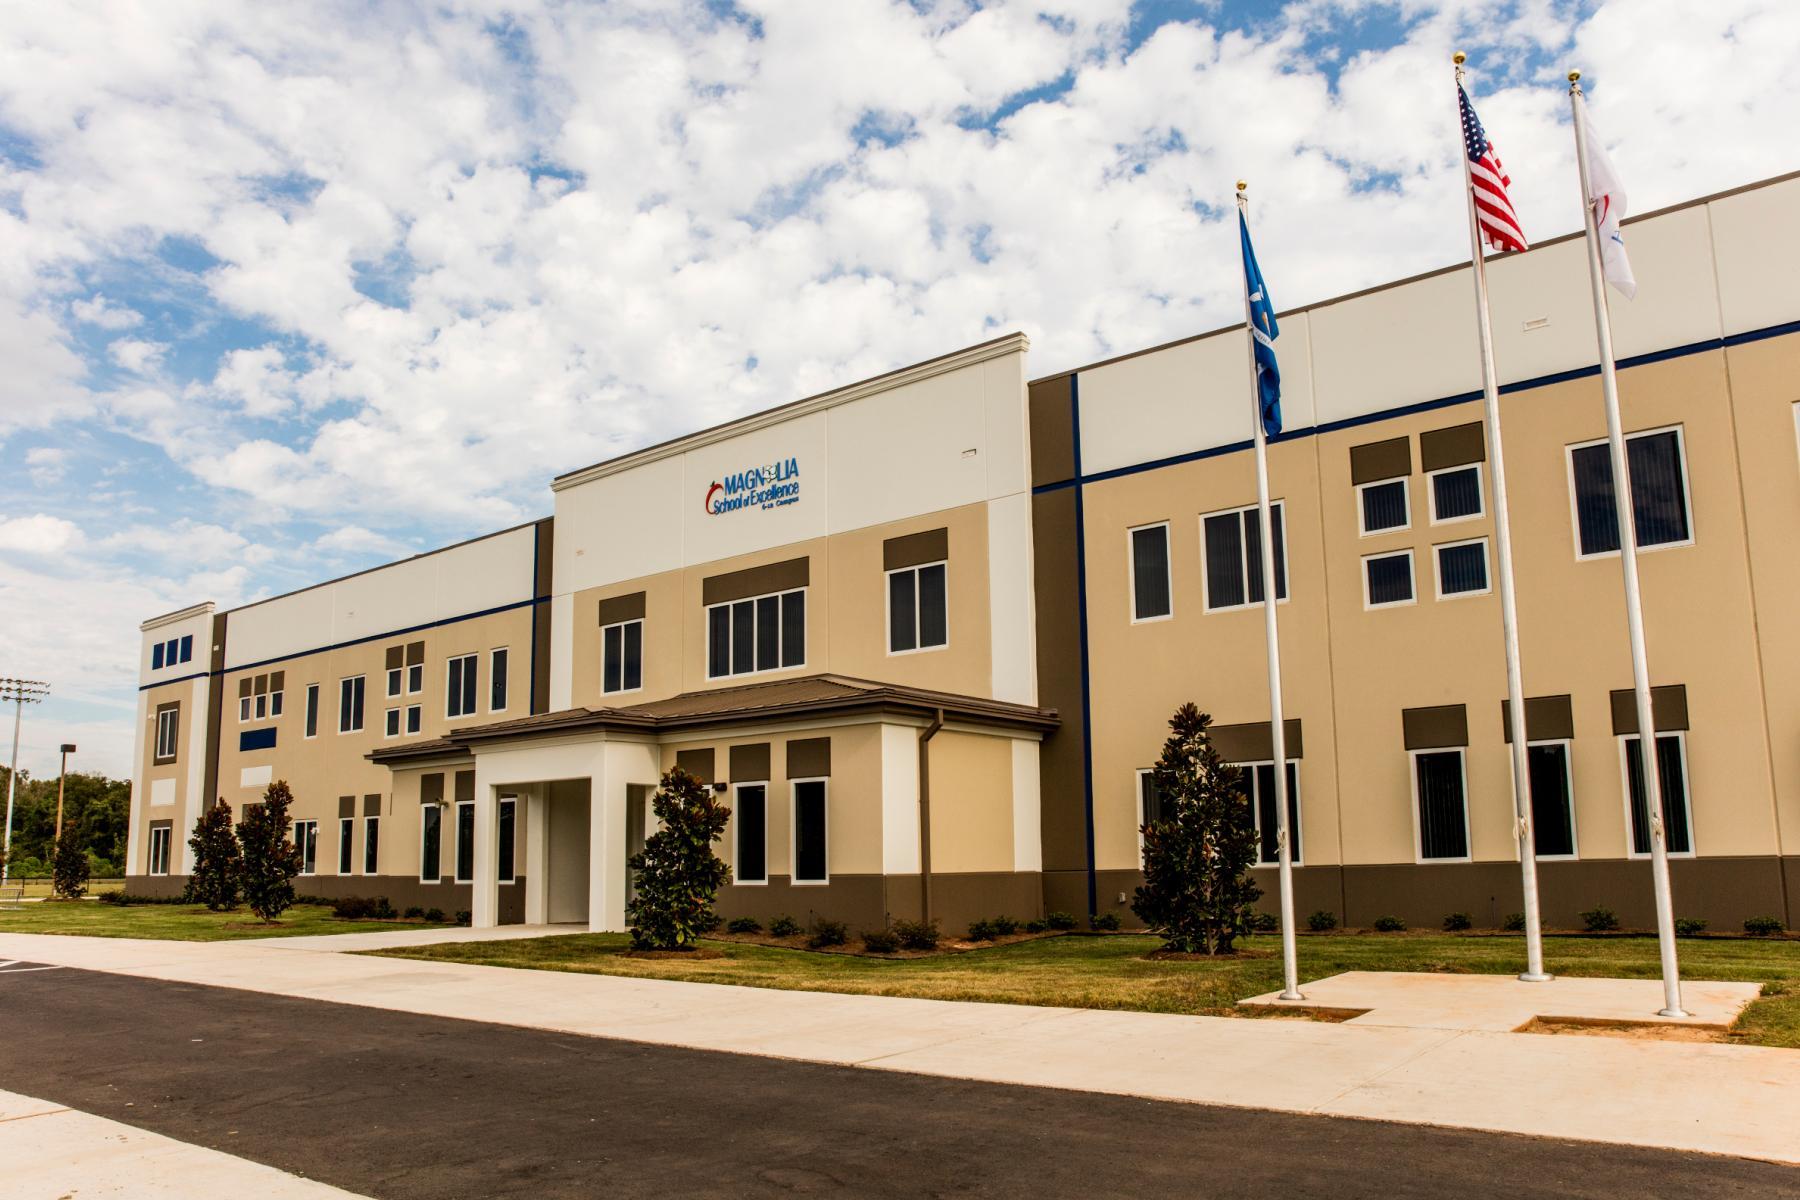 Magnolia school of excellence high school ryan companies for Exterior design school